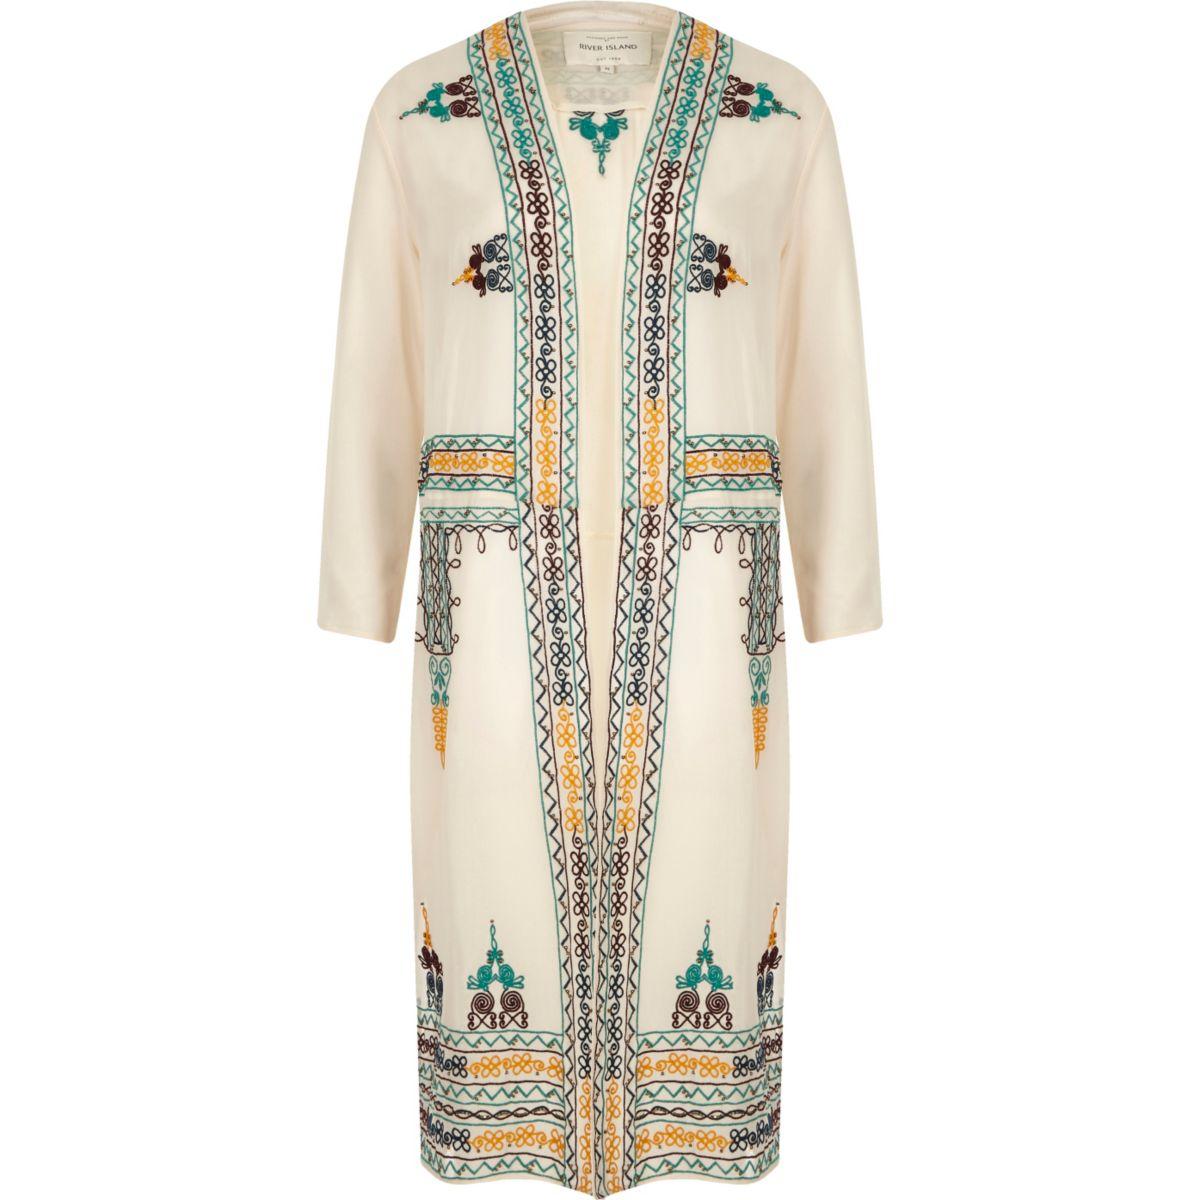 Cream sheer embroidered kimono